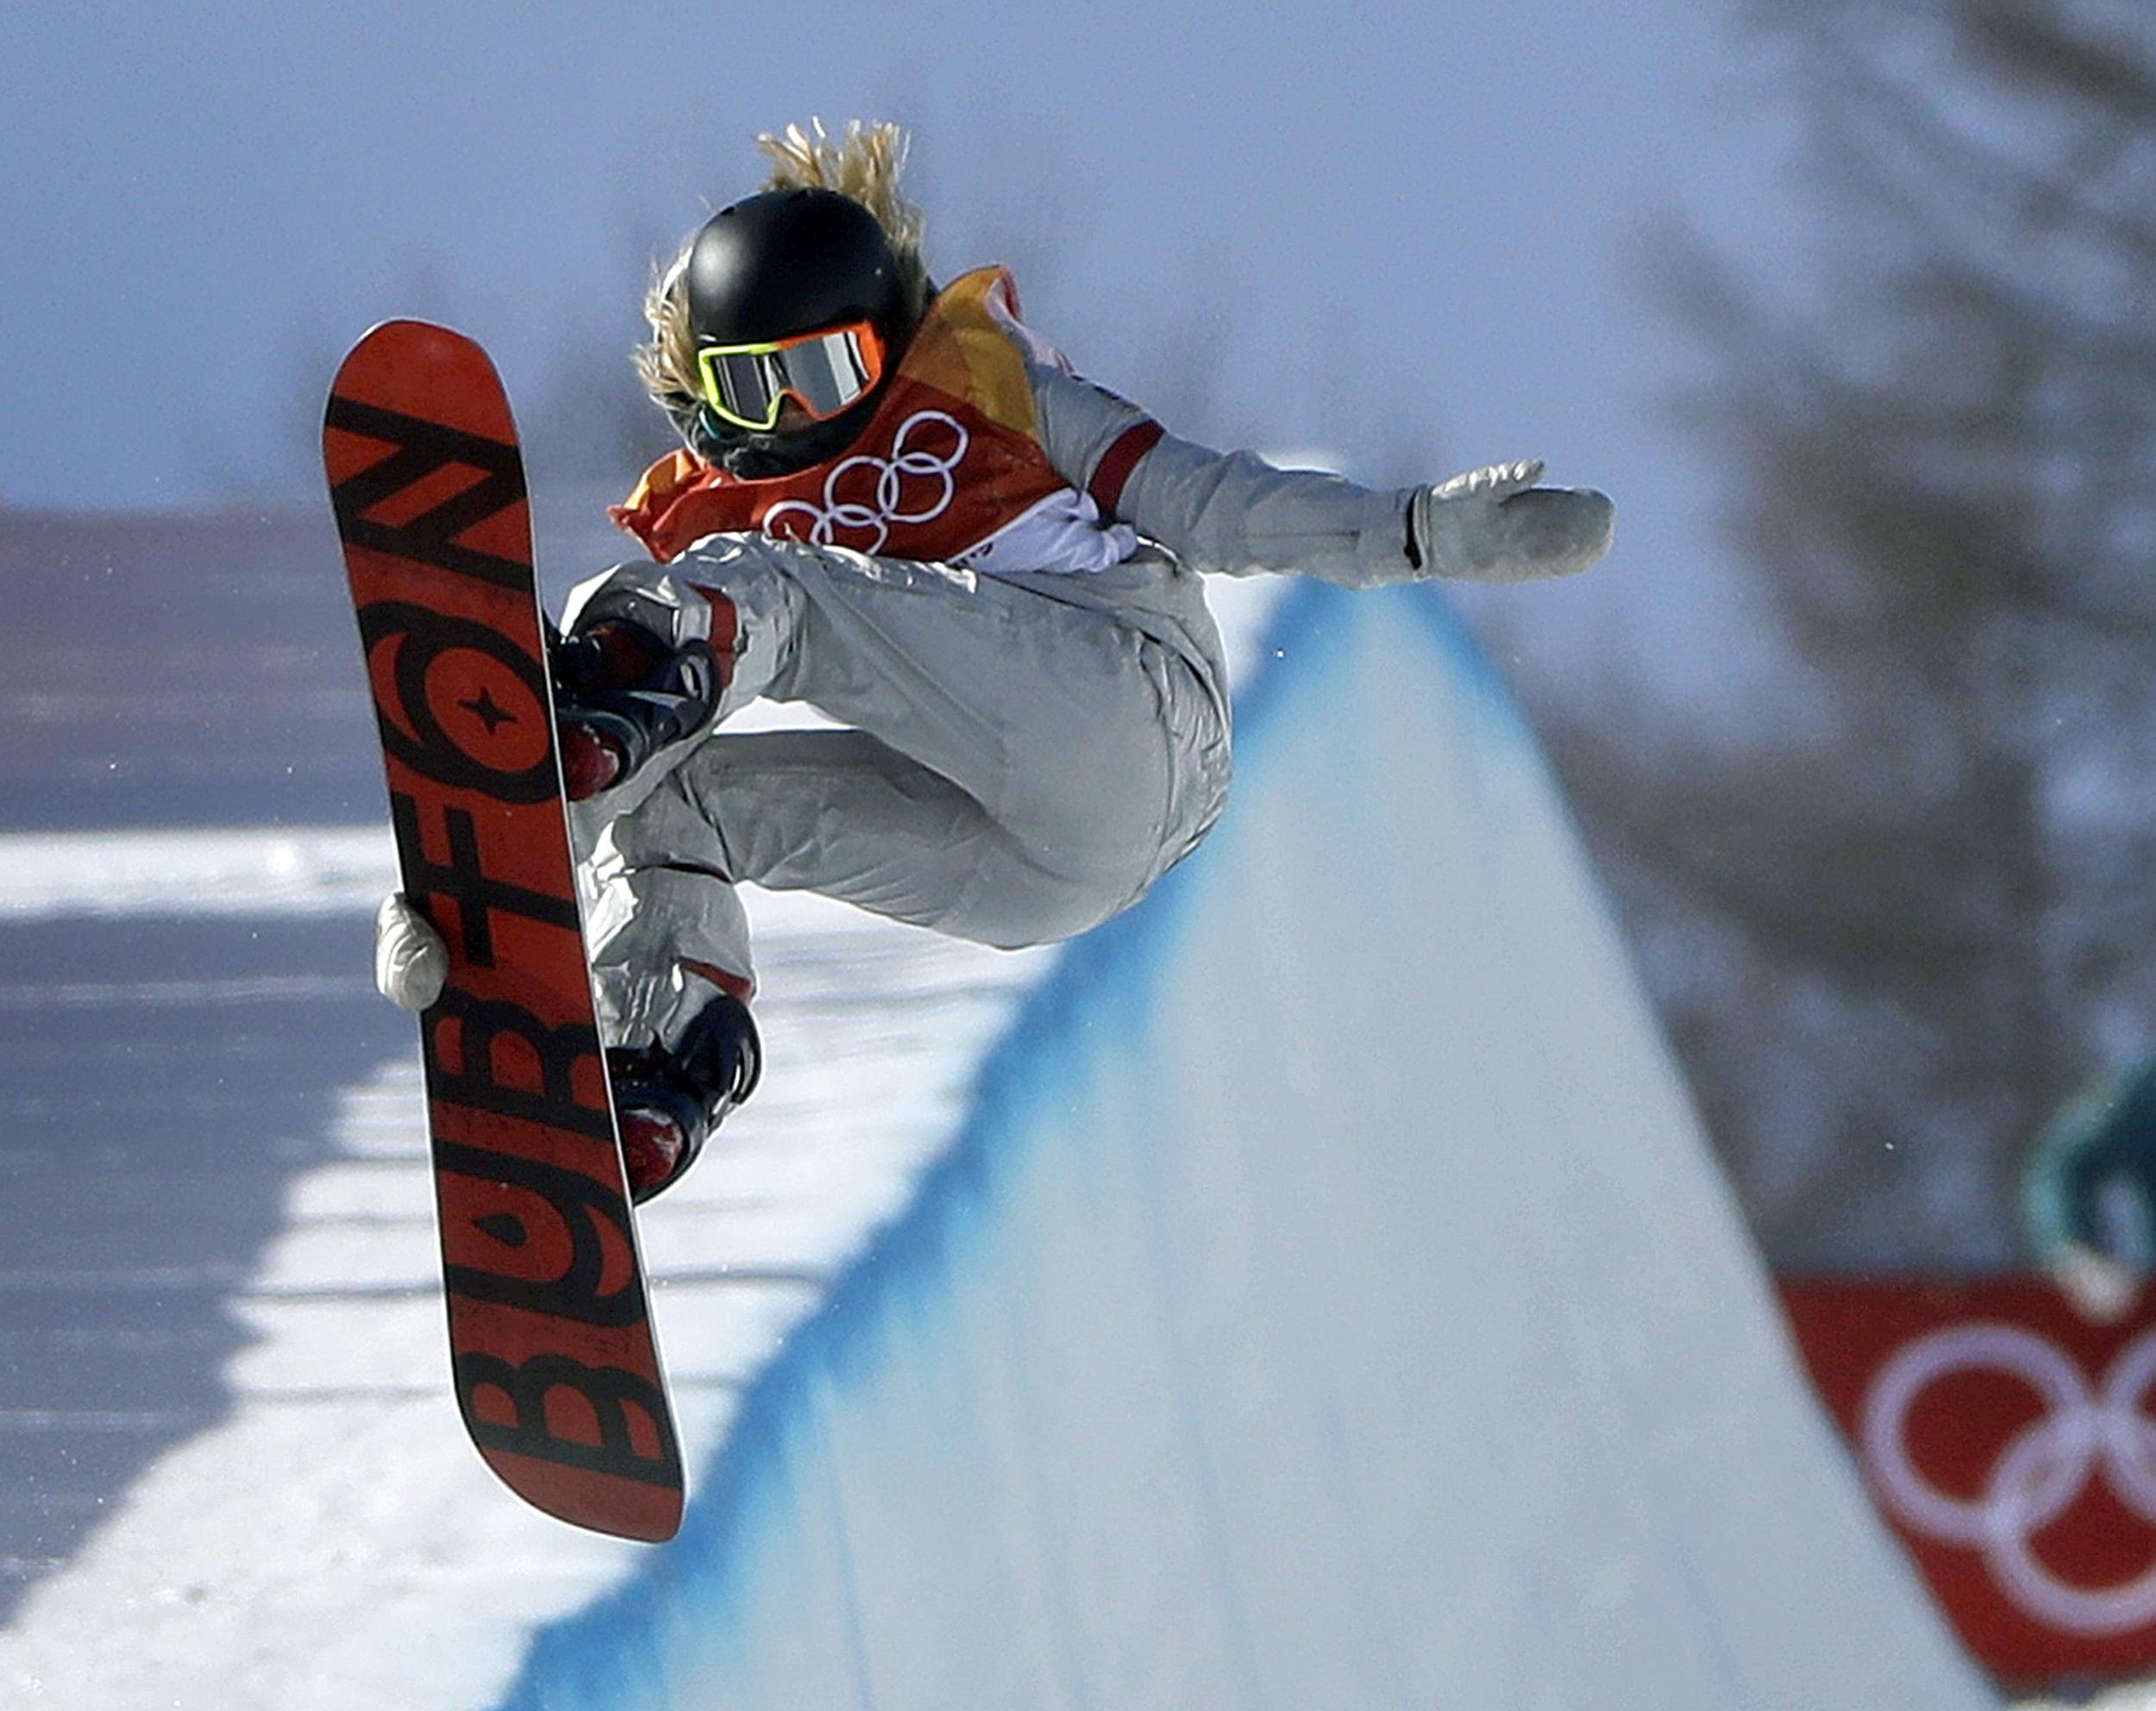 American phenom Chloe Kim wins gold in snowboard halfpipe